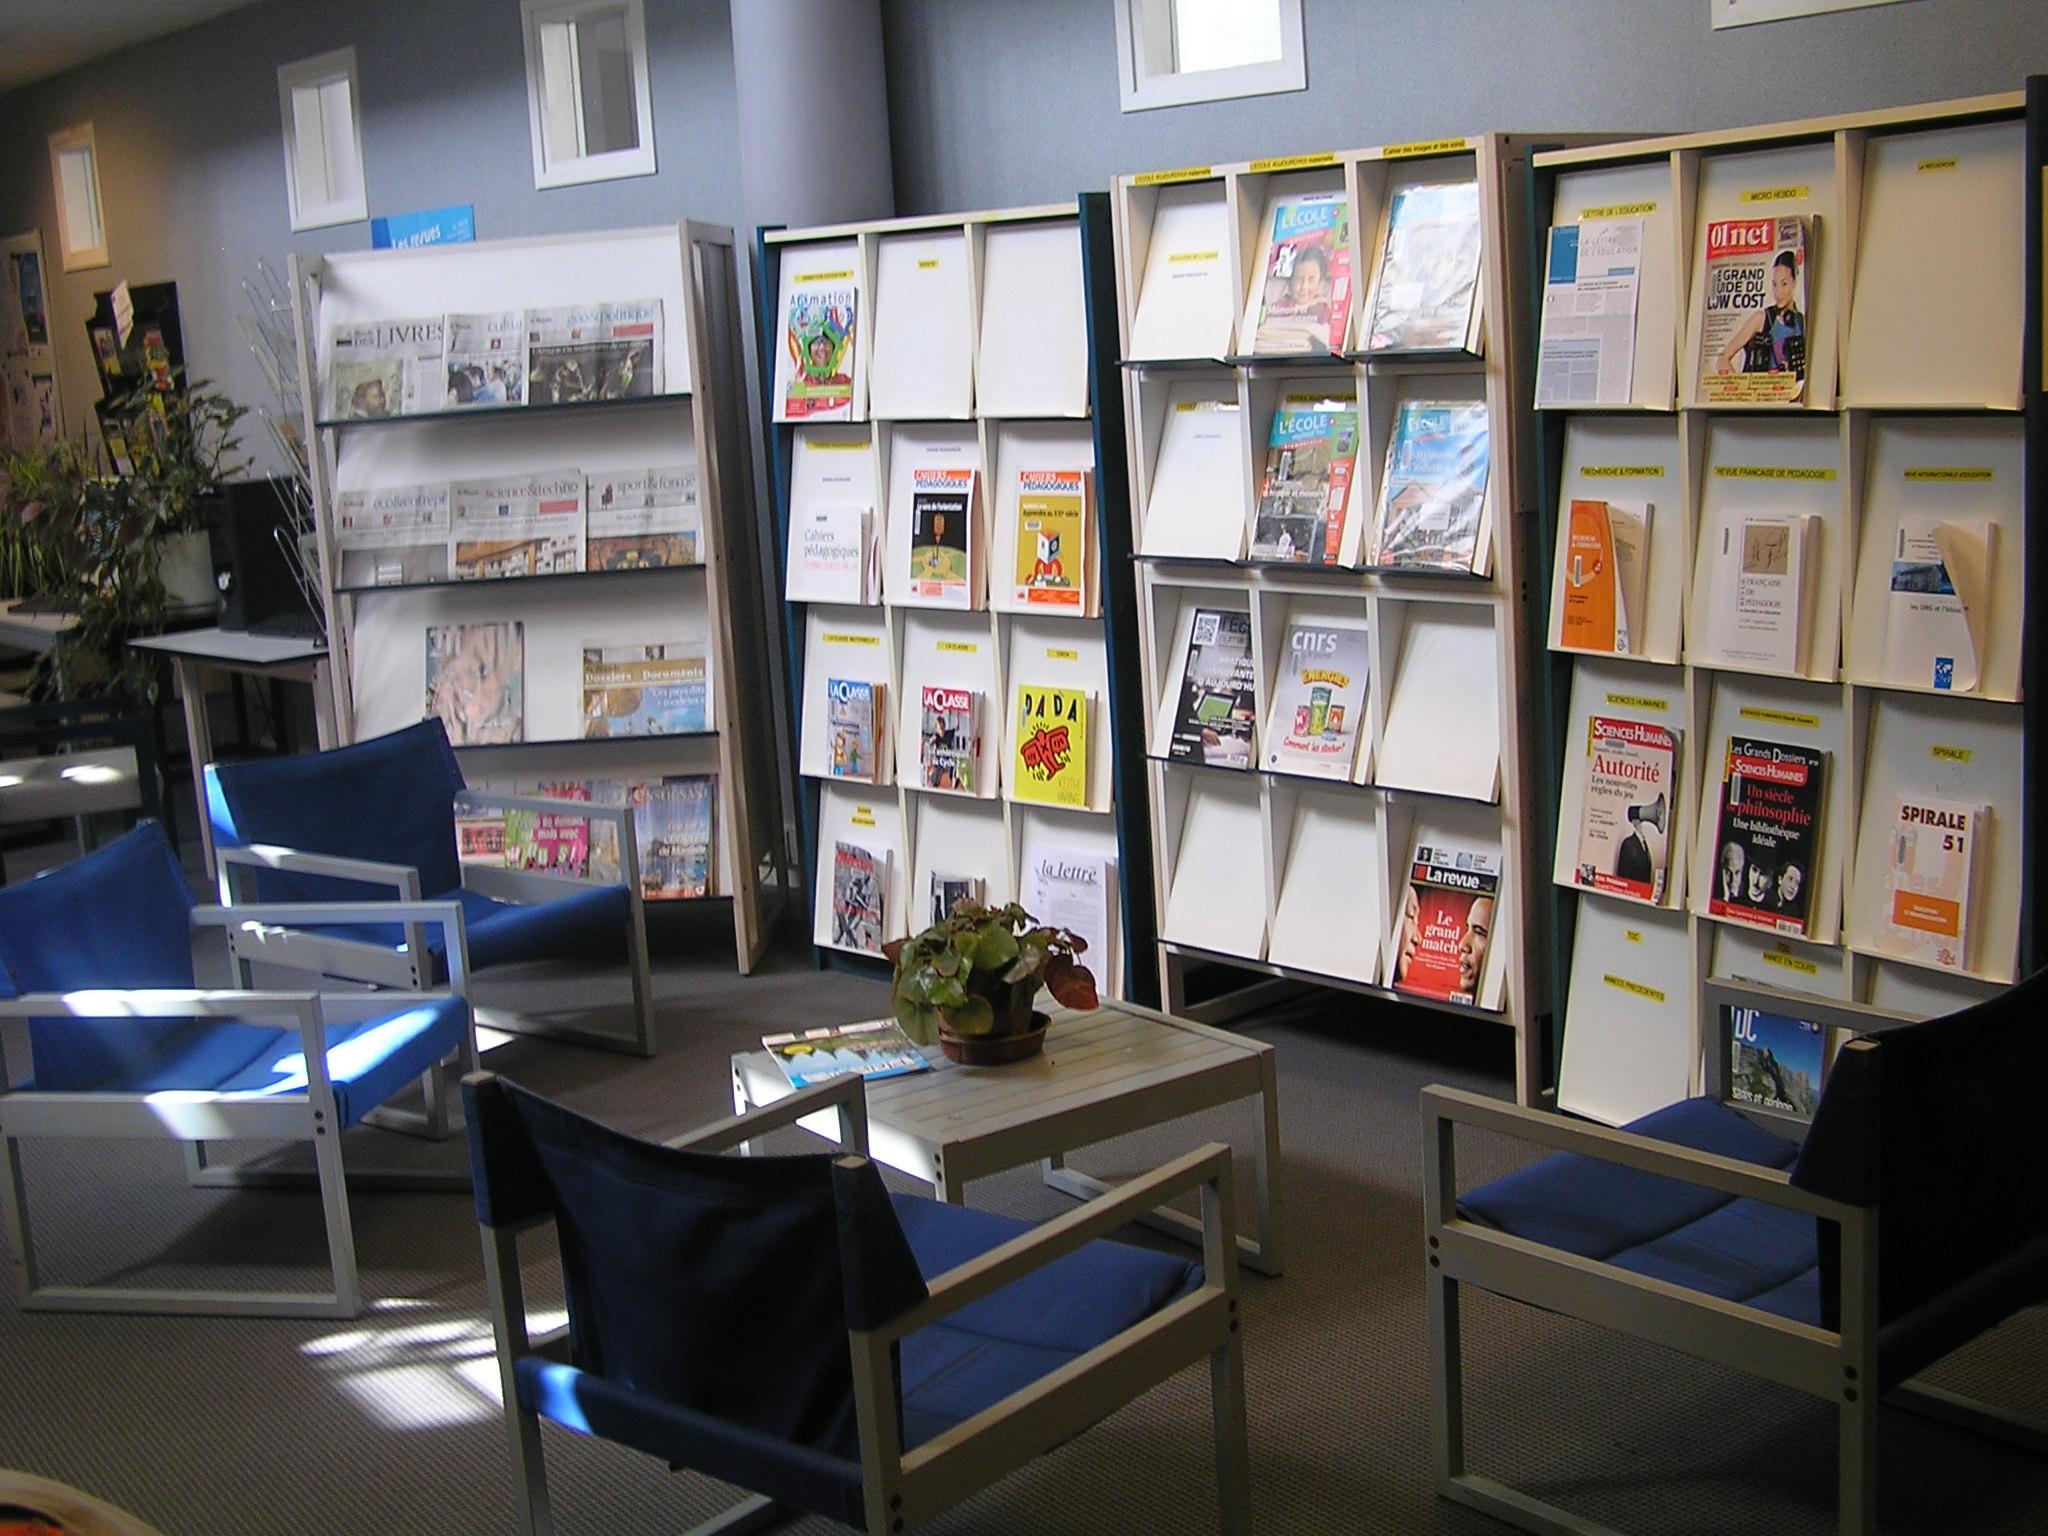 fichier biblioth que de formation des ma tres iufm brest france consultation revues jpg. Black Bedroom Furniture Sets. Home Design Ideas